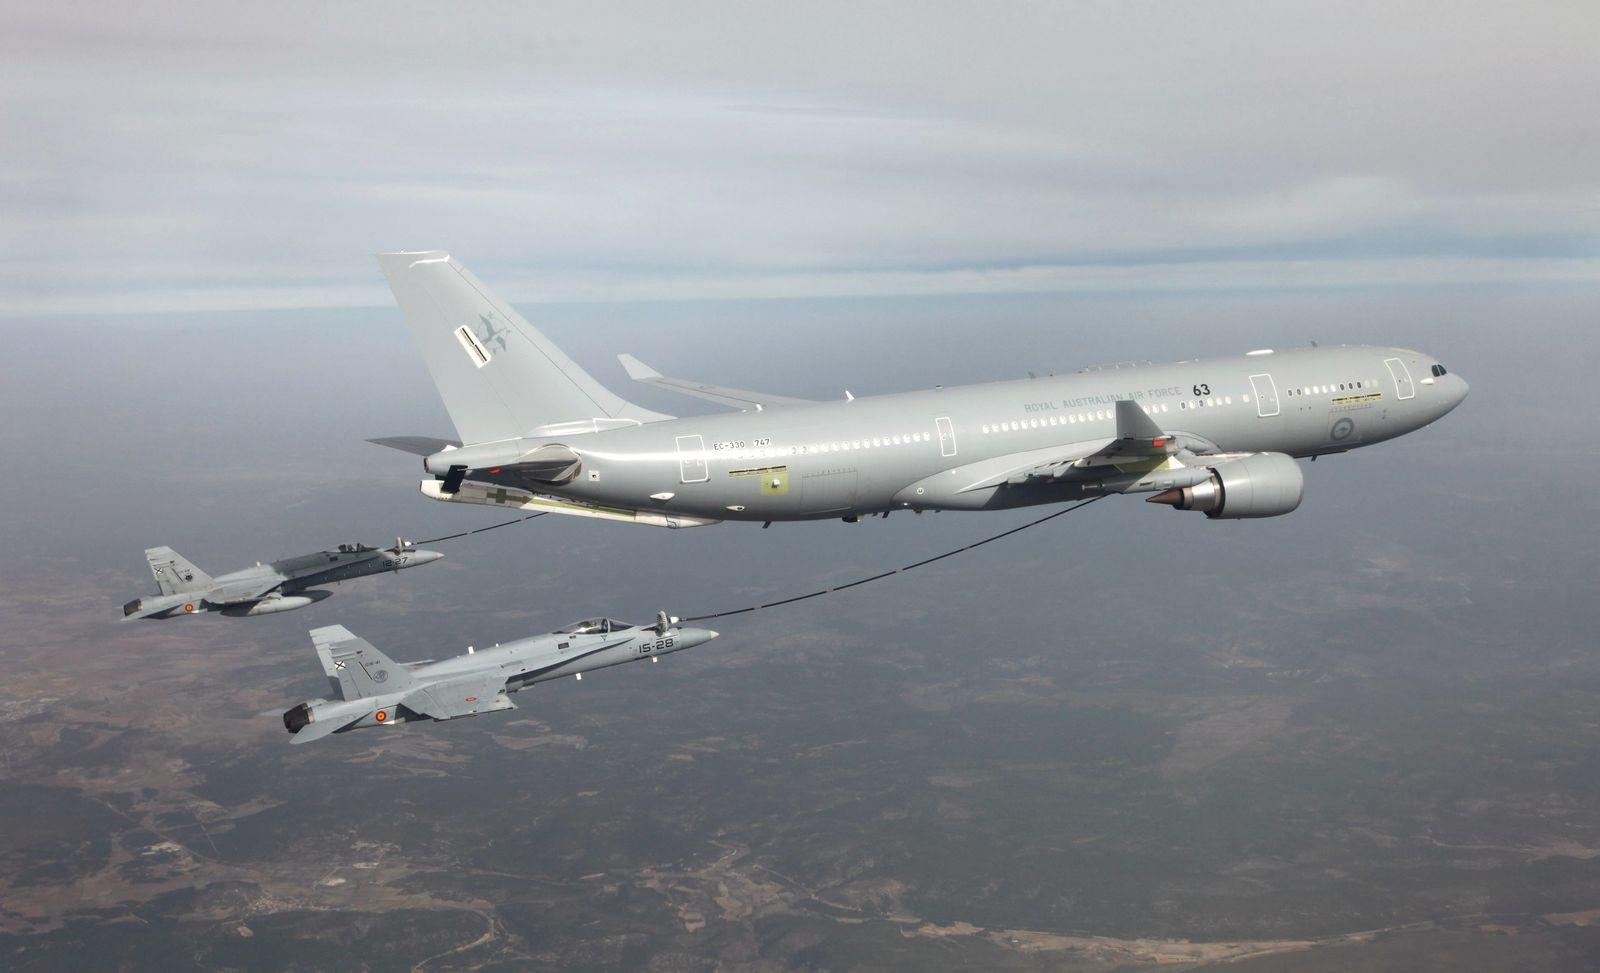 USA / Tanker / Tankflugzeug / Airbus A330 Multi Role / Variante des EADS KC-45